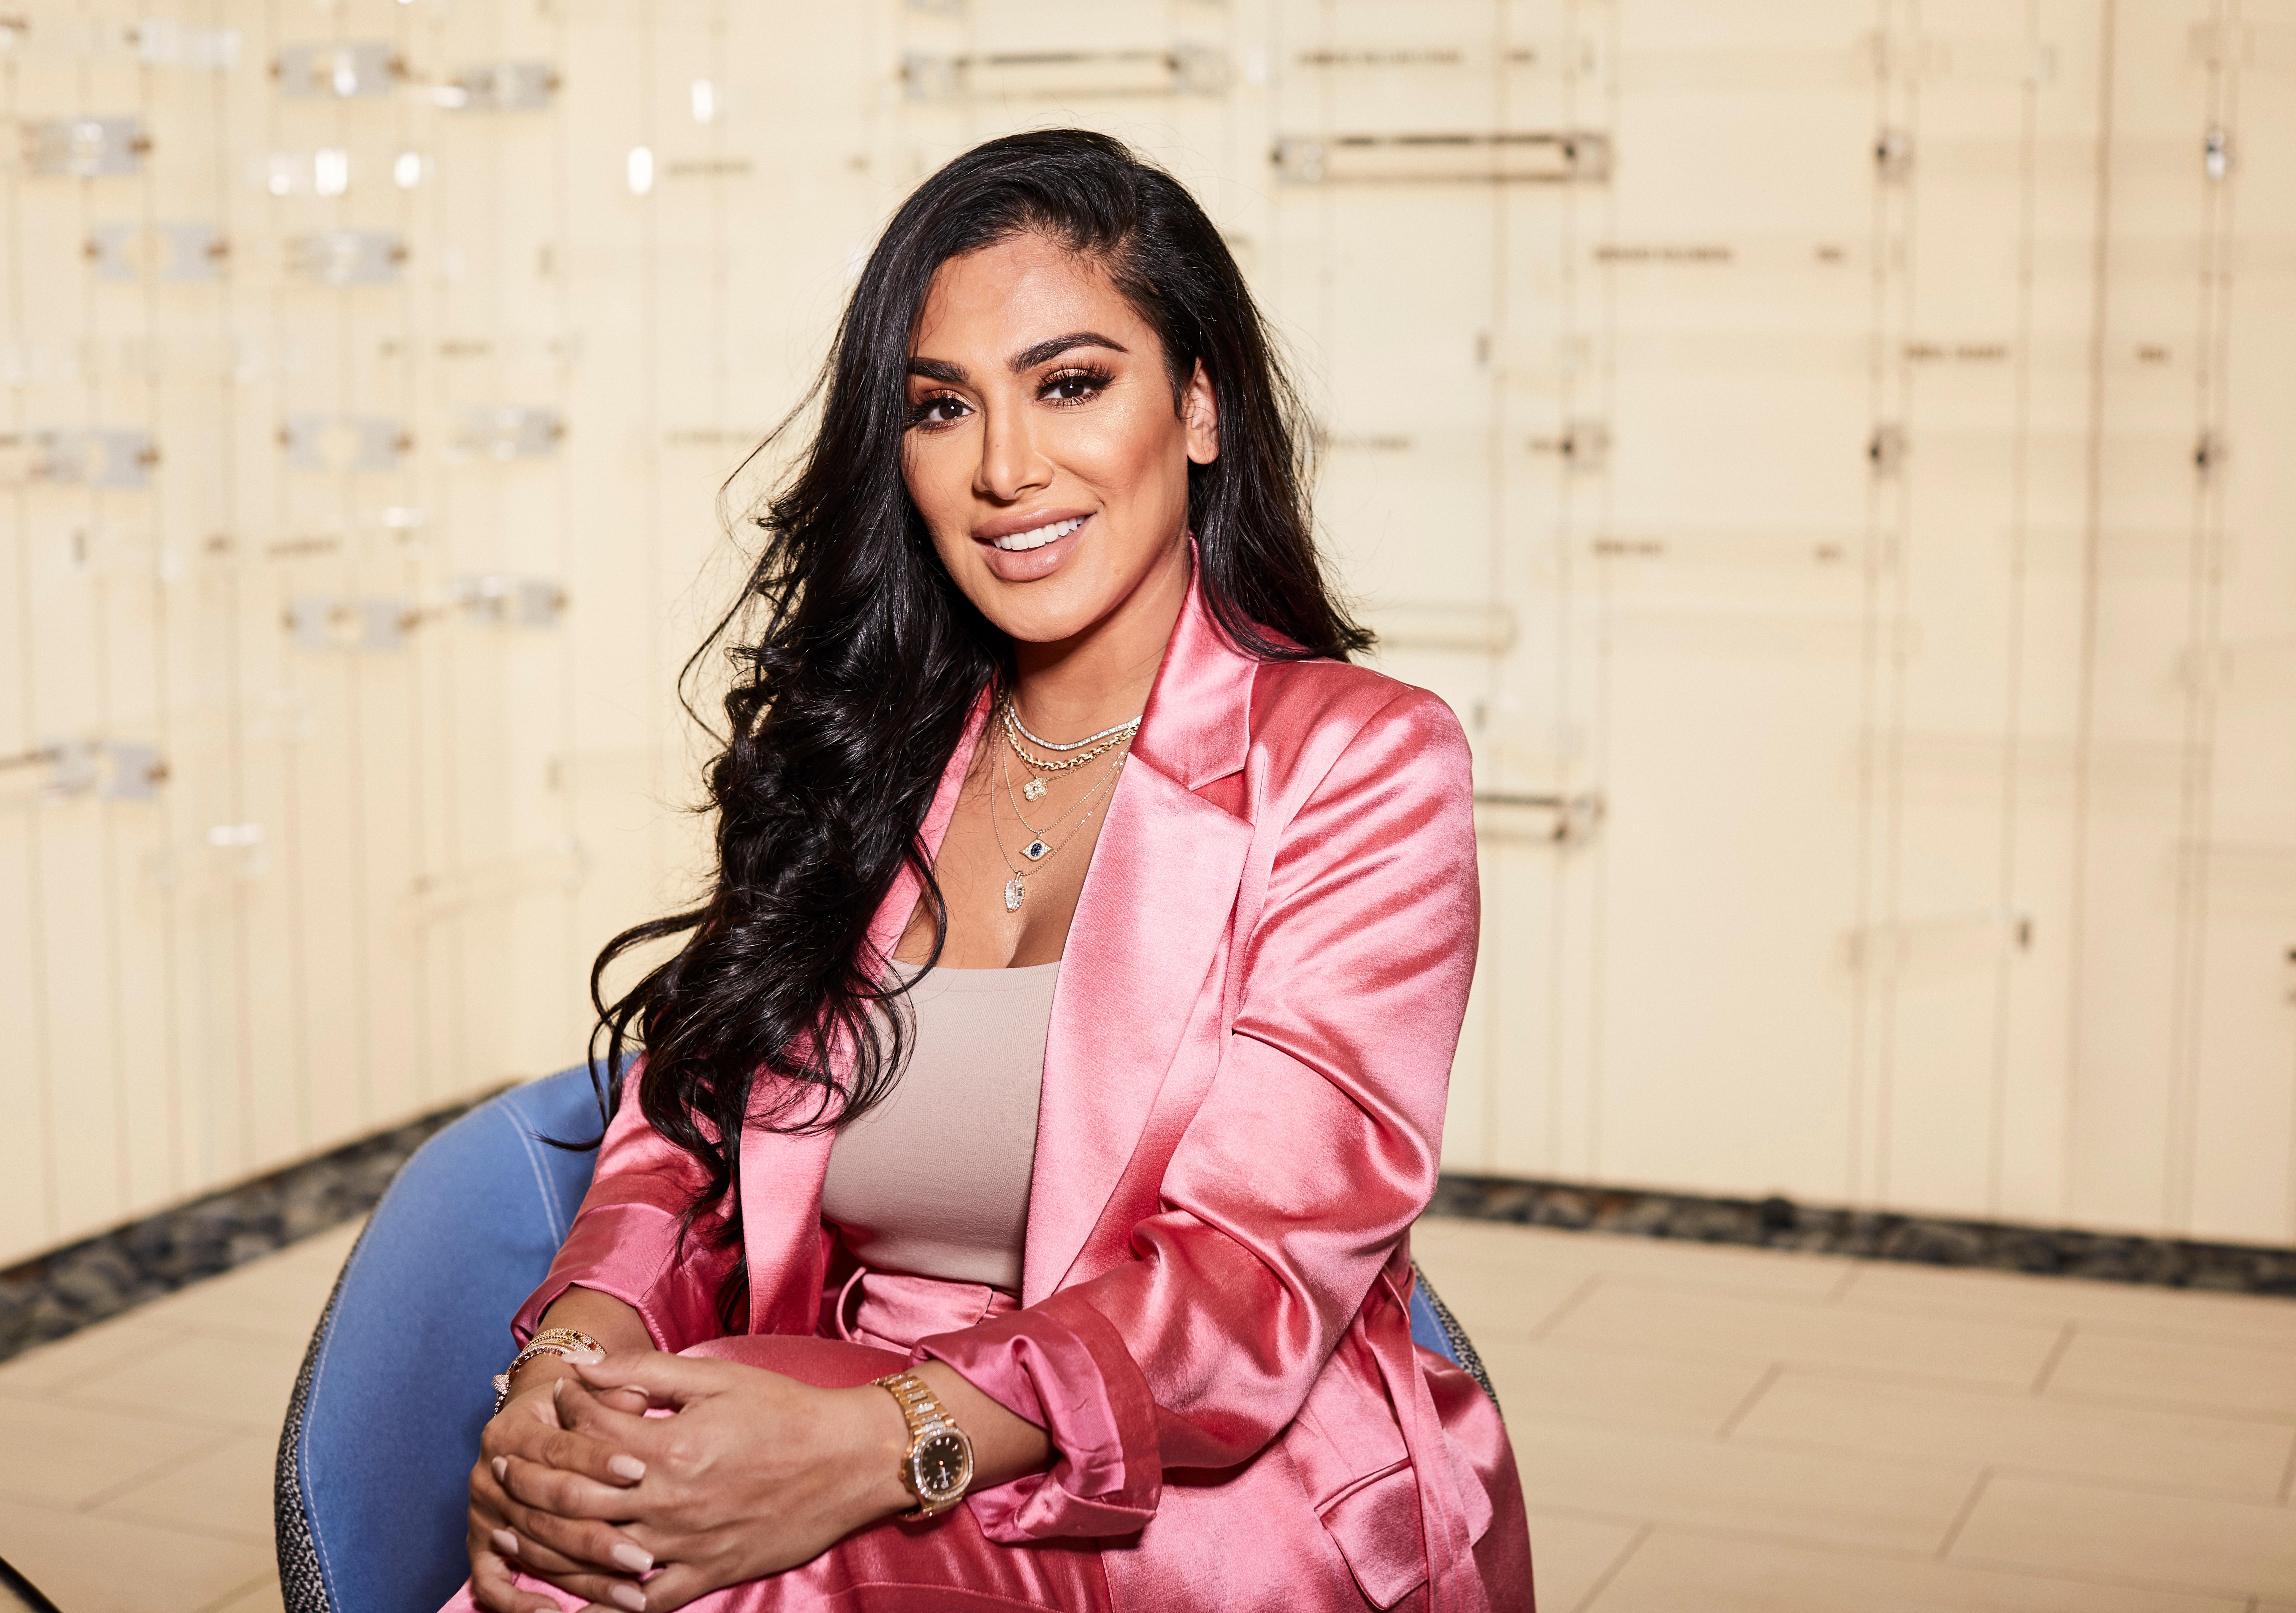 Huda Kattan poses for a portrait in New YorkHuda Kattan and Mona Kattan Portrait Session, New York, USA - 13 Jun 2018